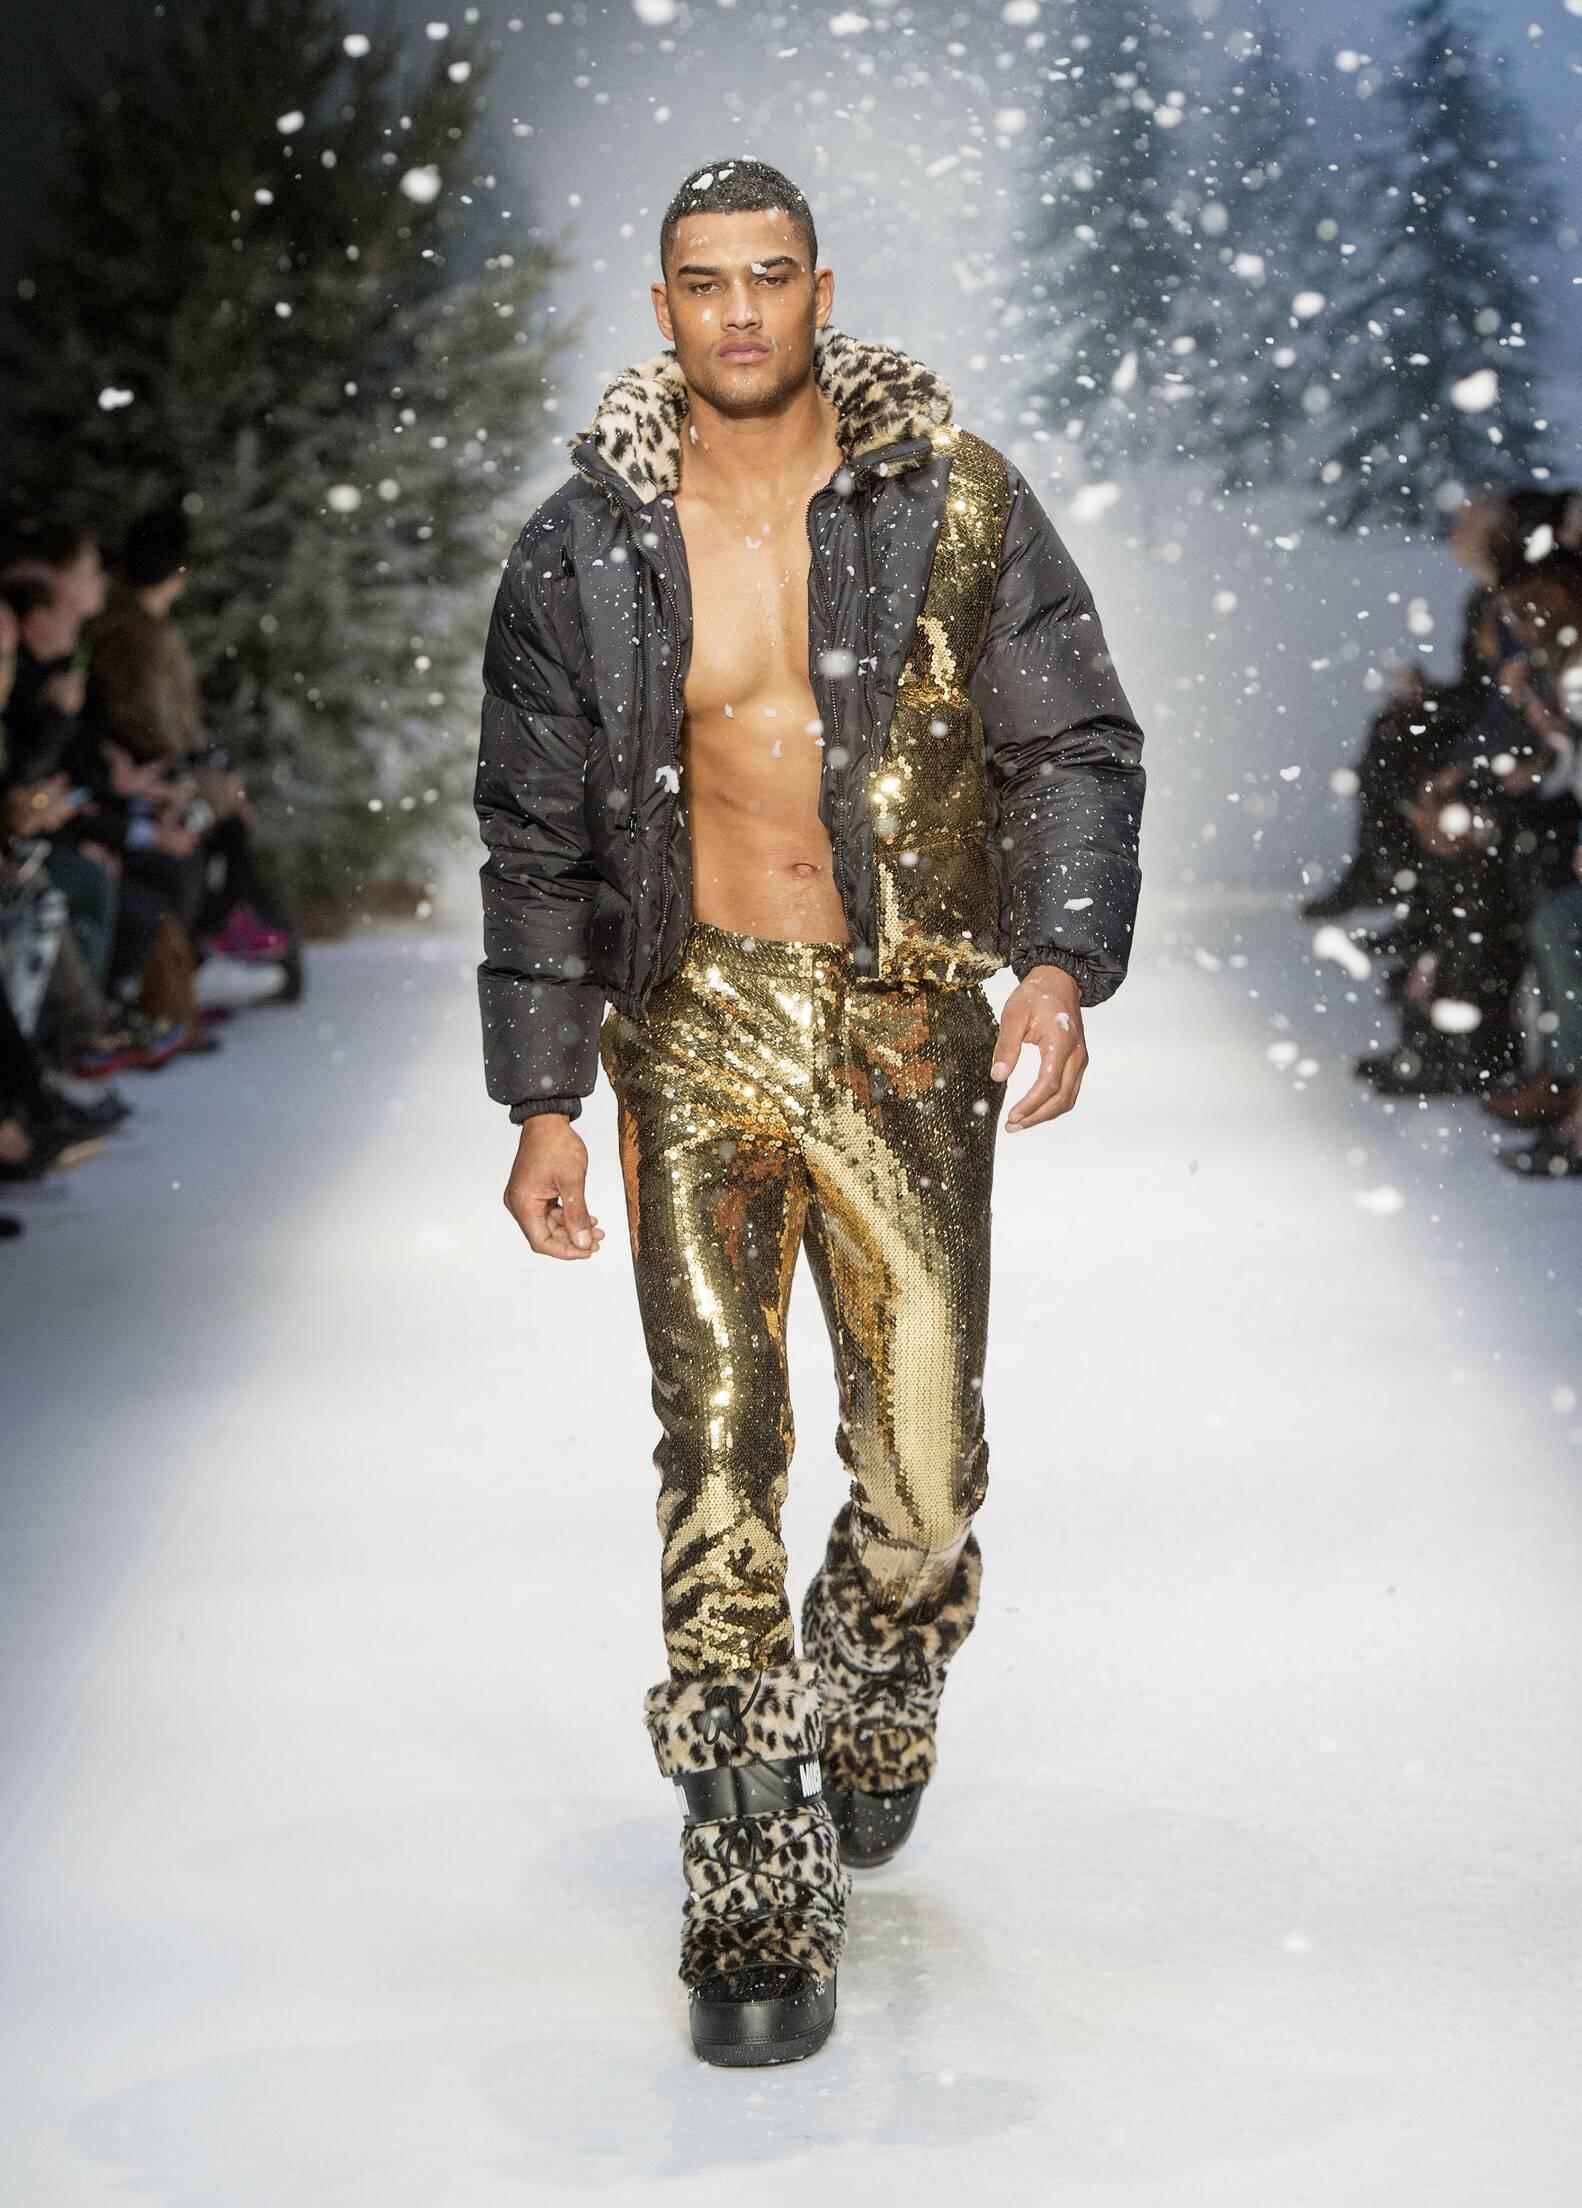 Catwalk Moschino Fw 2015 16 Menswear